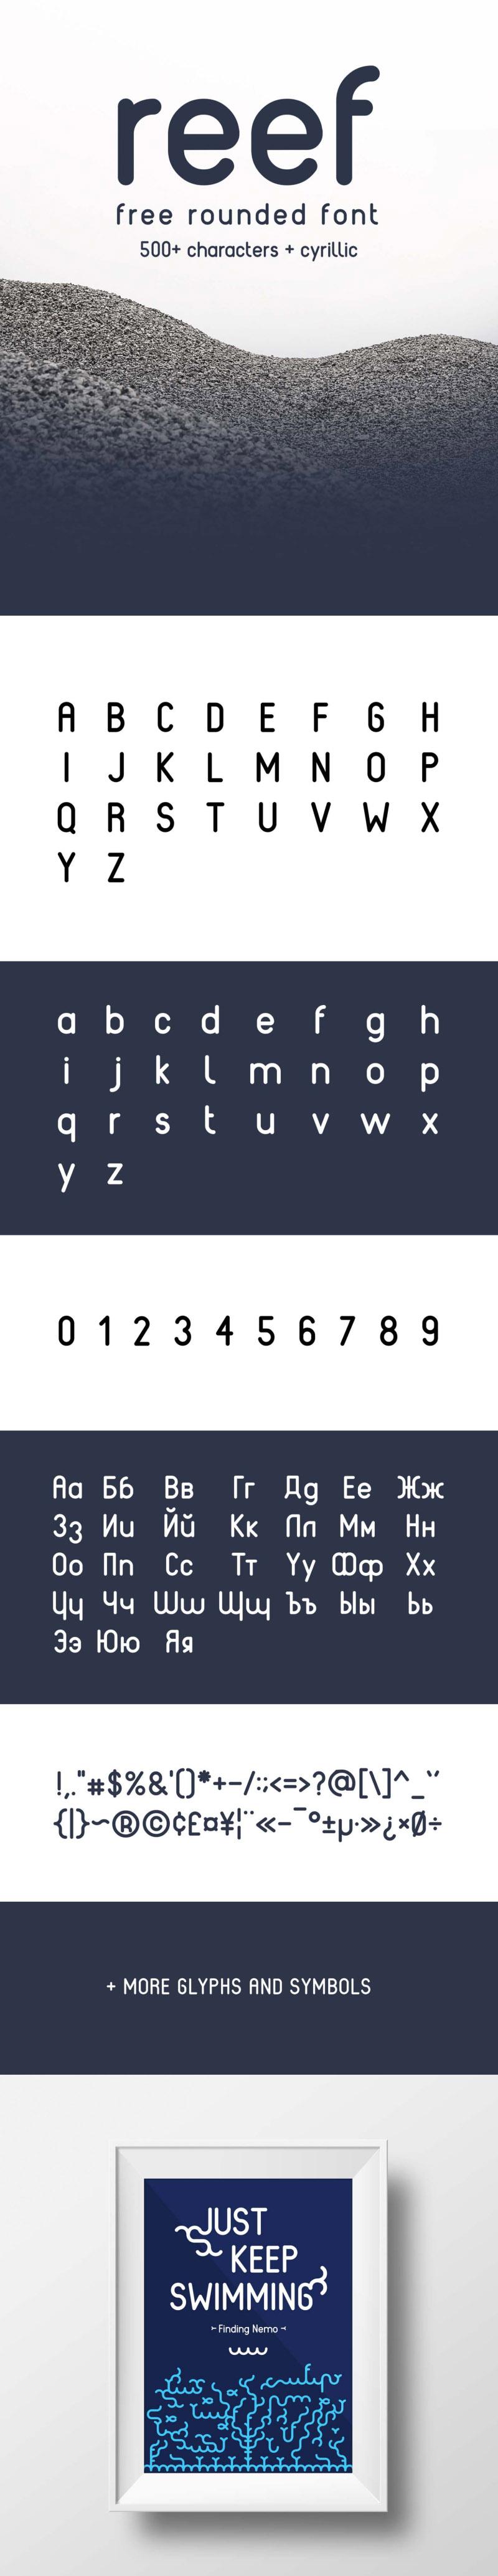 Reef Free Font - WILDTYPE